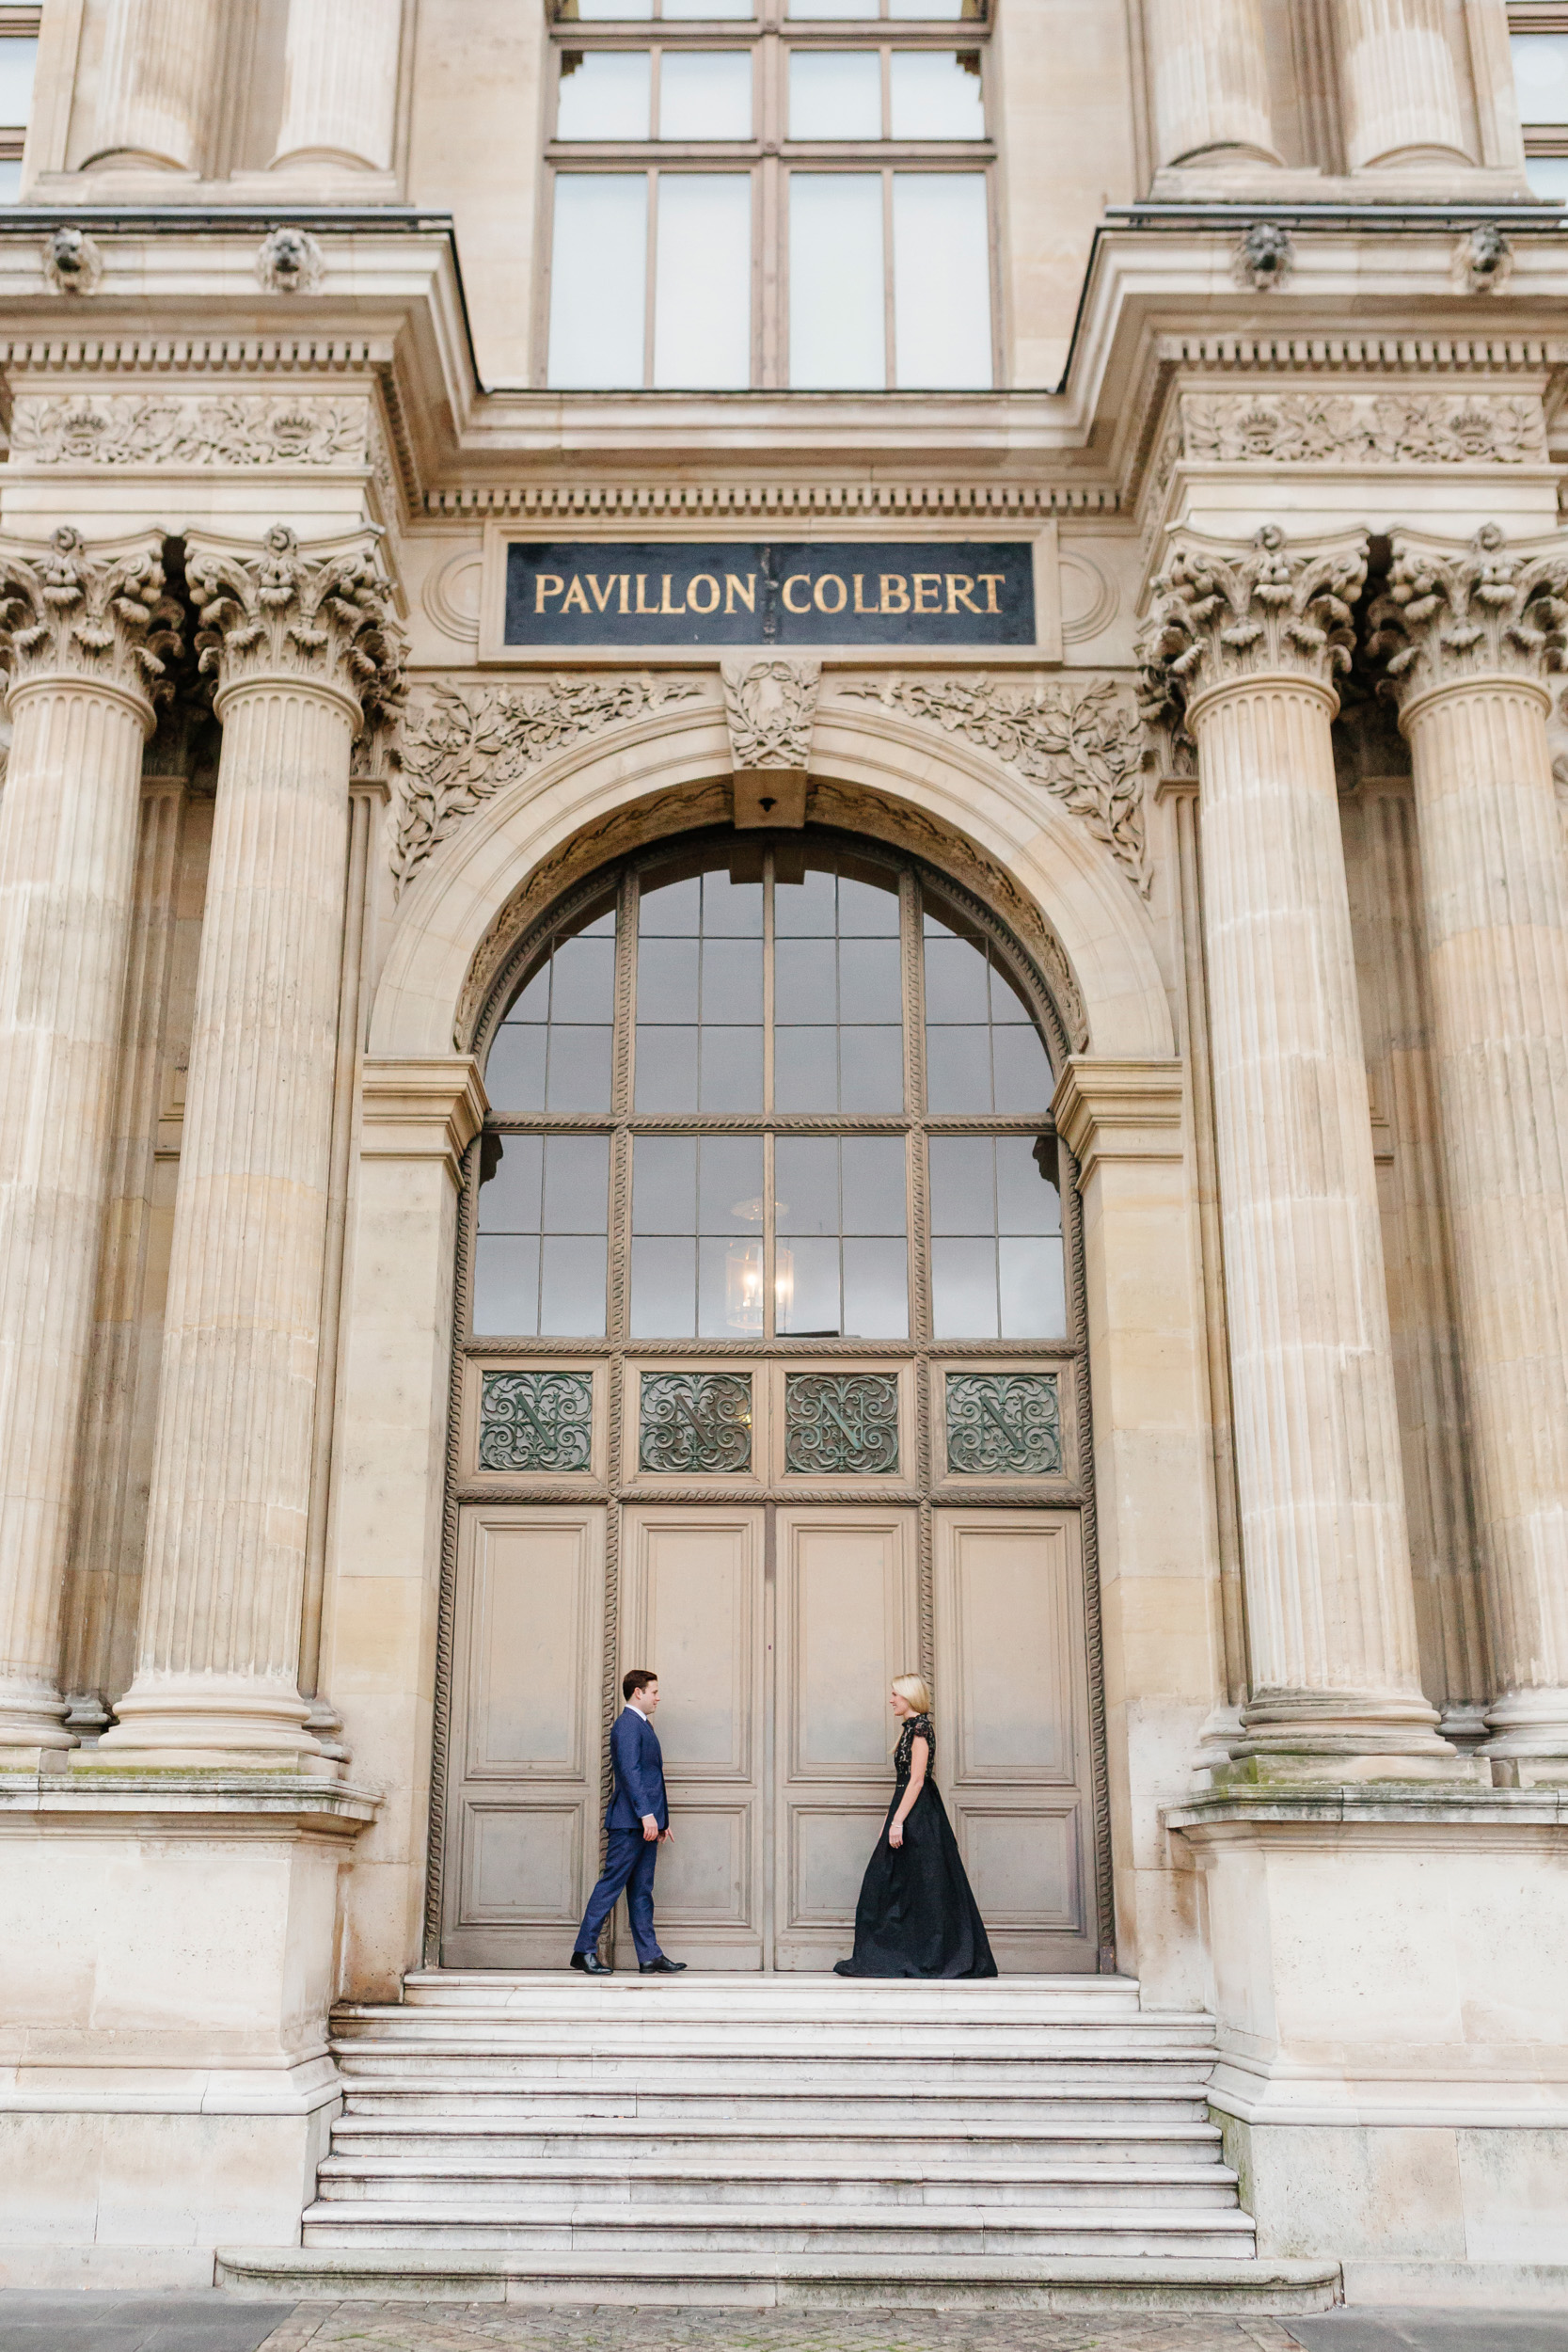 Paris vacation couple portrait standing by the door of Pavillon Colbert at Louvre Museum captured by Paris Photographer Federico Guendel www.iheartparis.fr